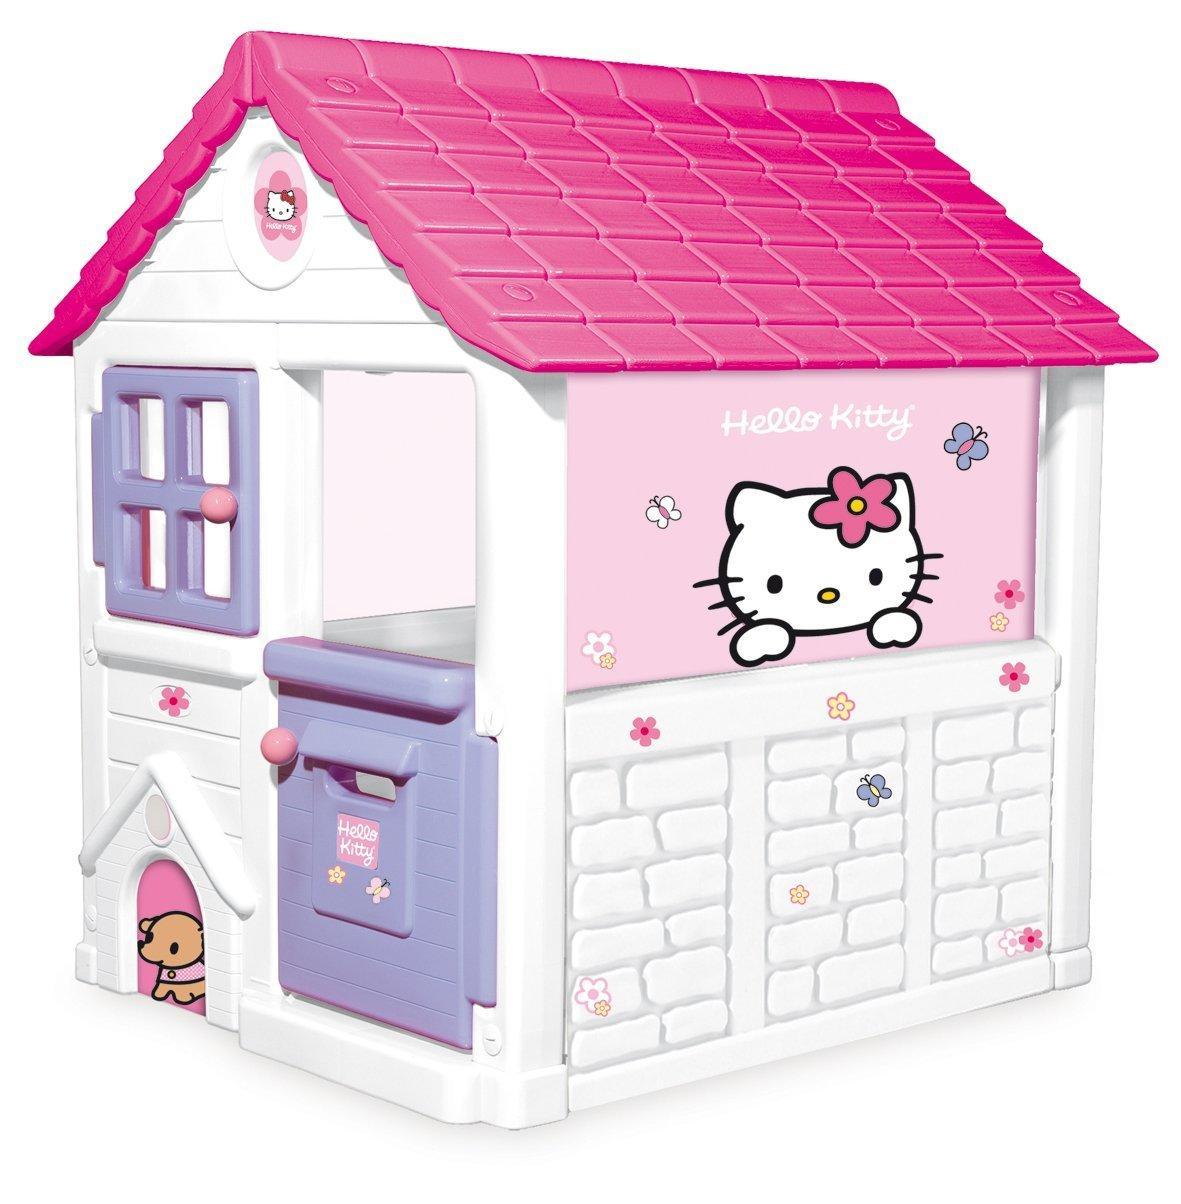 Casette In Resina Per Bambini.Offerta Casetta Per Bambini In Resina Da Giardino Smoby 7600310431 Sweet Home Hello Kitty